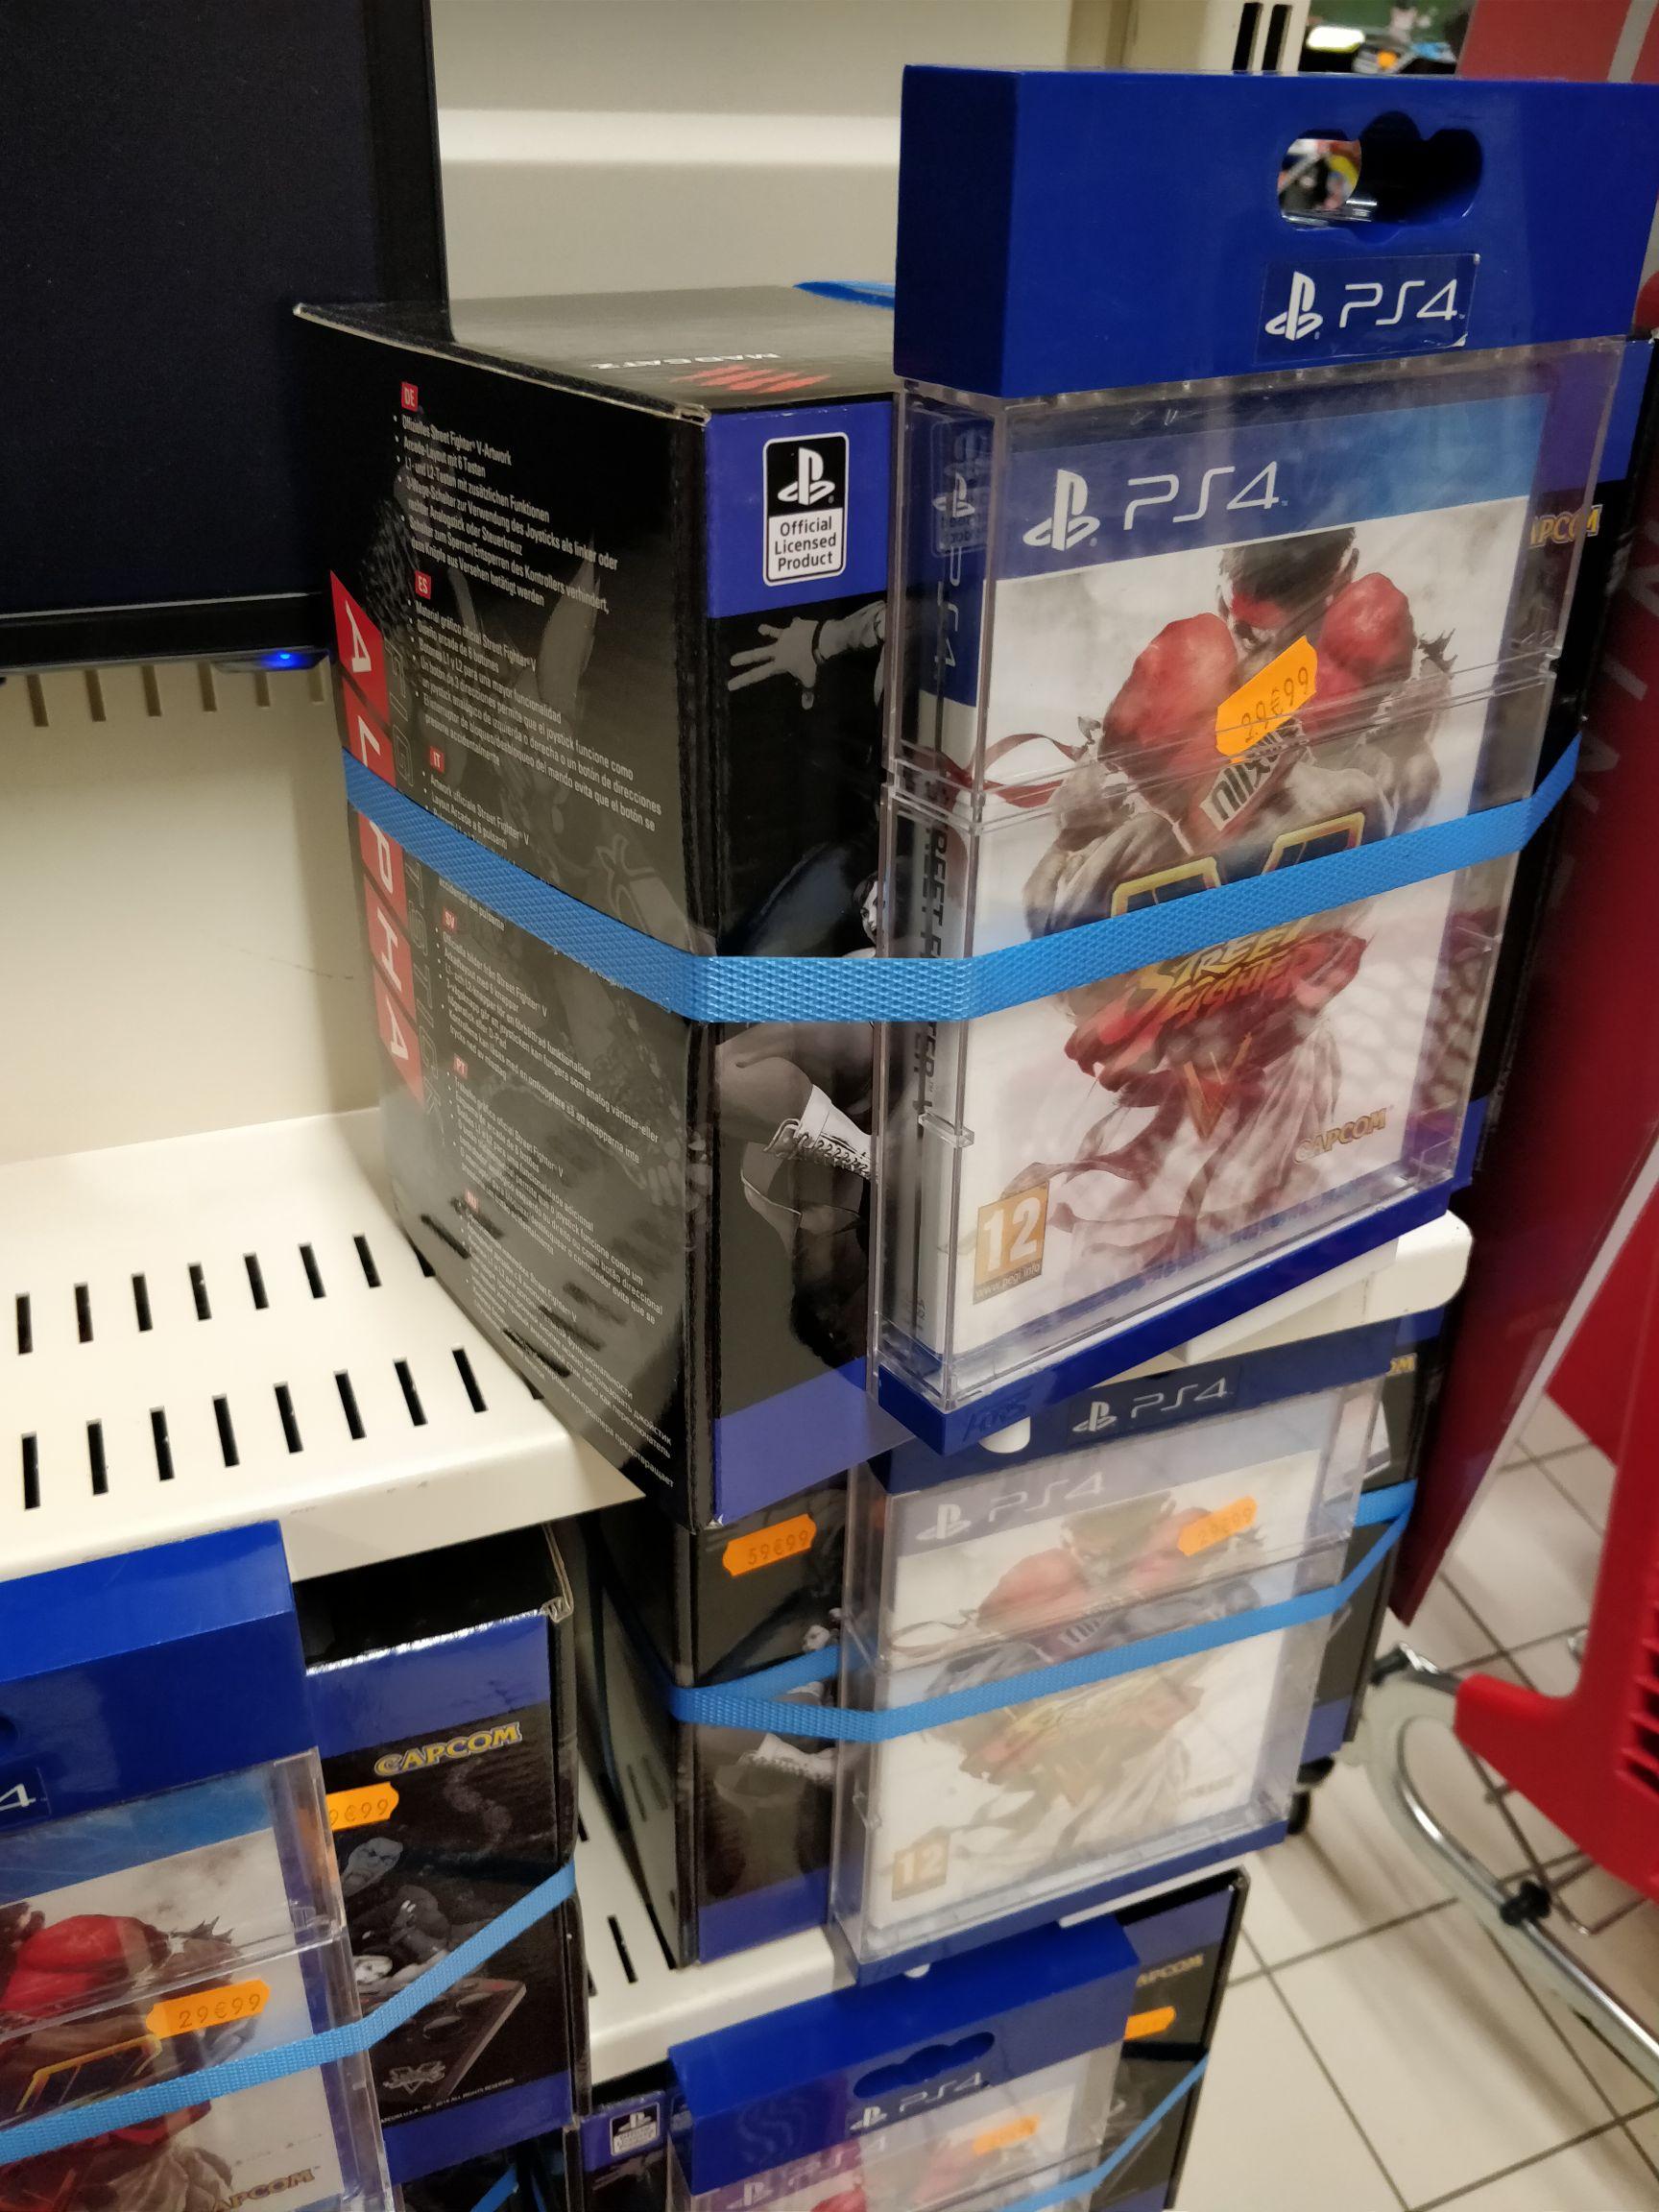 Pack manette Mad Catz Street Fighter V Arcade FightStick Alpha (pour PS3 / PS4) + Street Fighter V sur PS4 au Auchan Caluire (69)